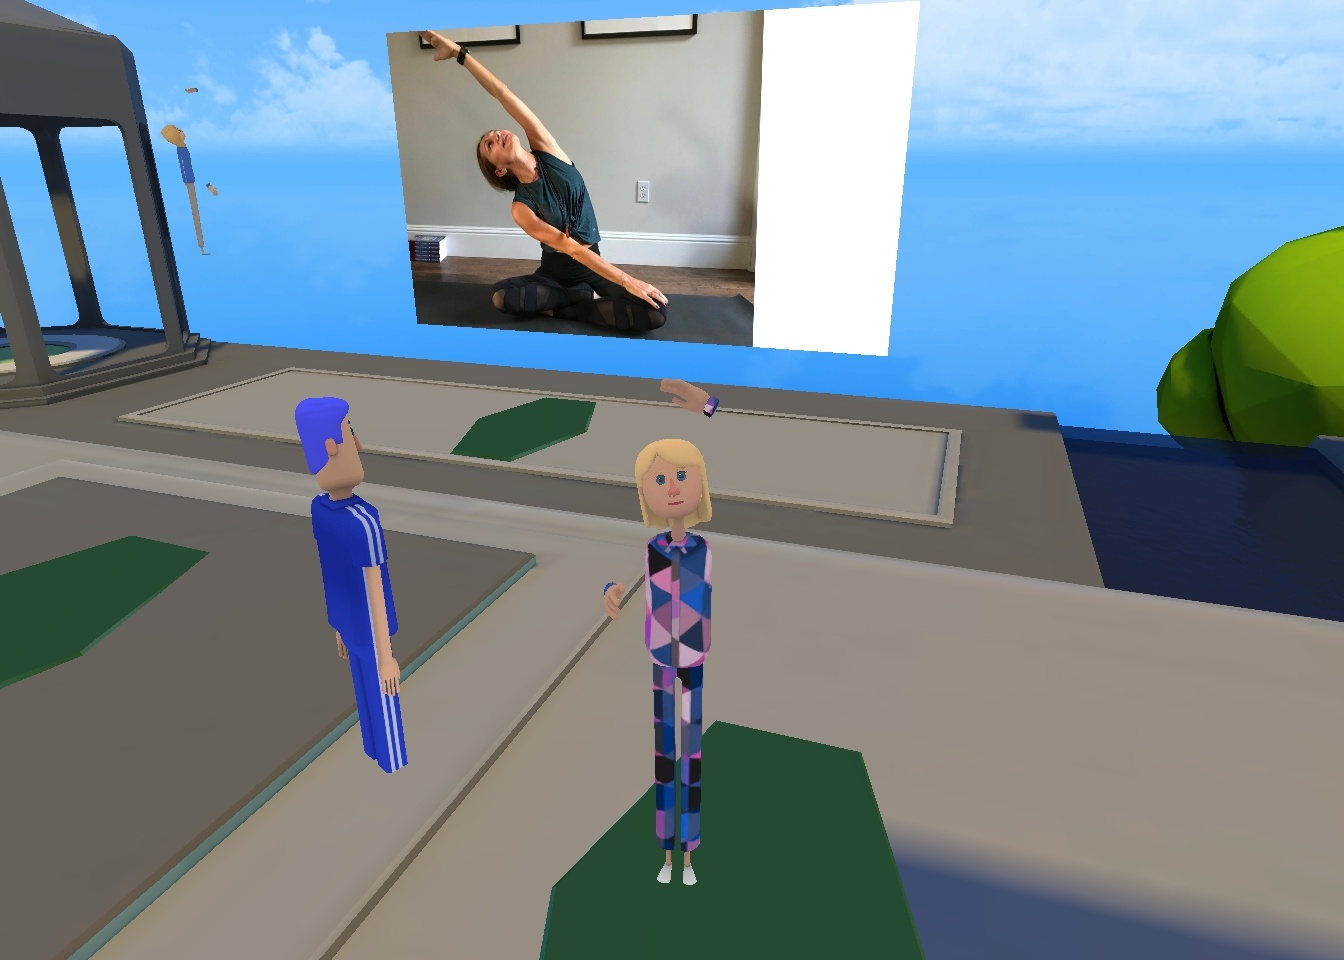 VR image of AltSpaceVR